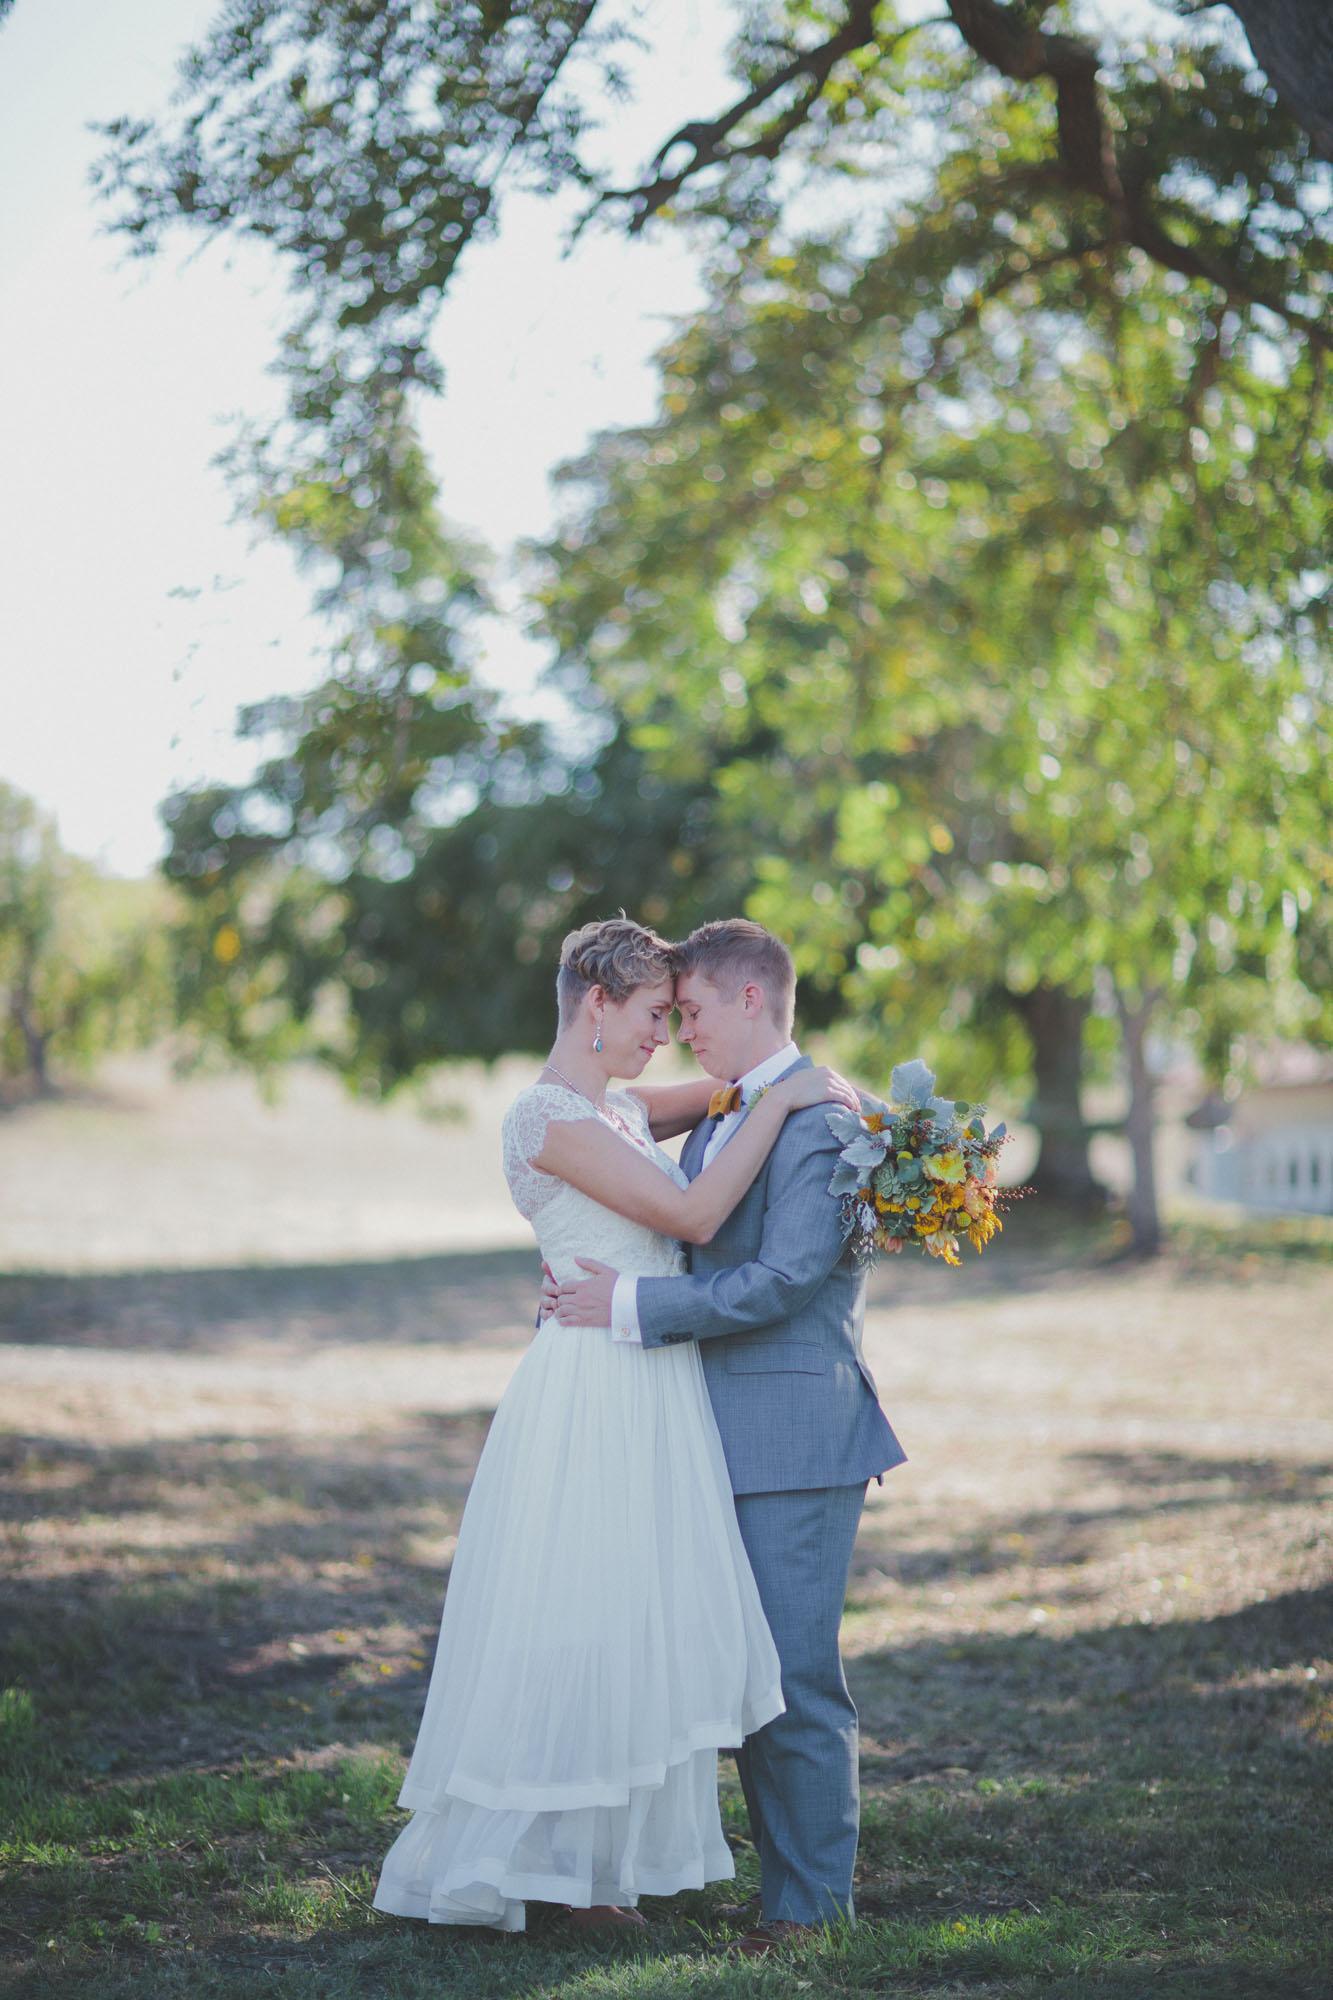 Gretchen_Gause_Petaluma_Olympias_Valley_Wedding_Photo-099.jpg